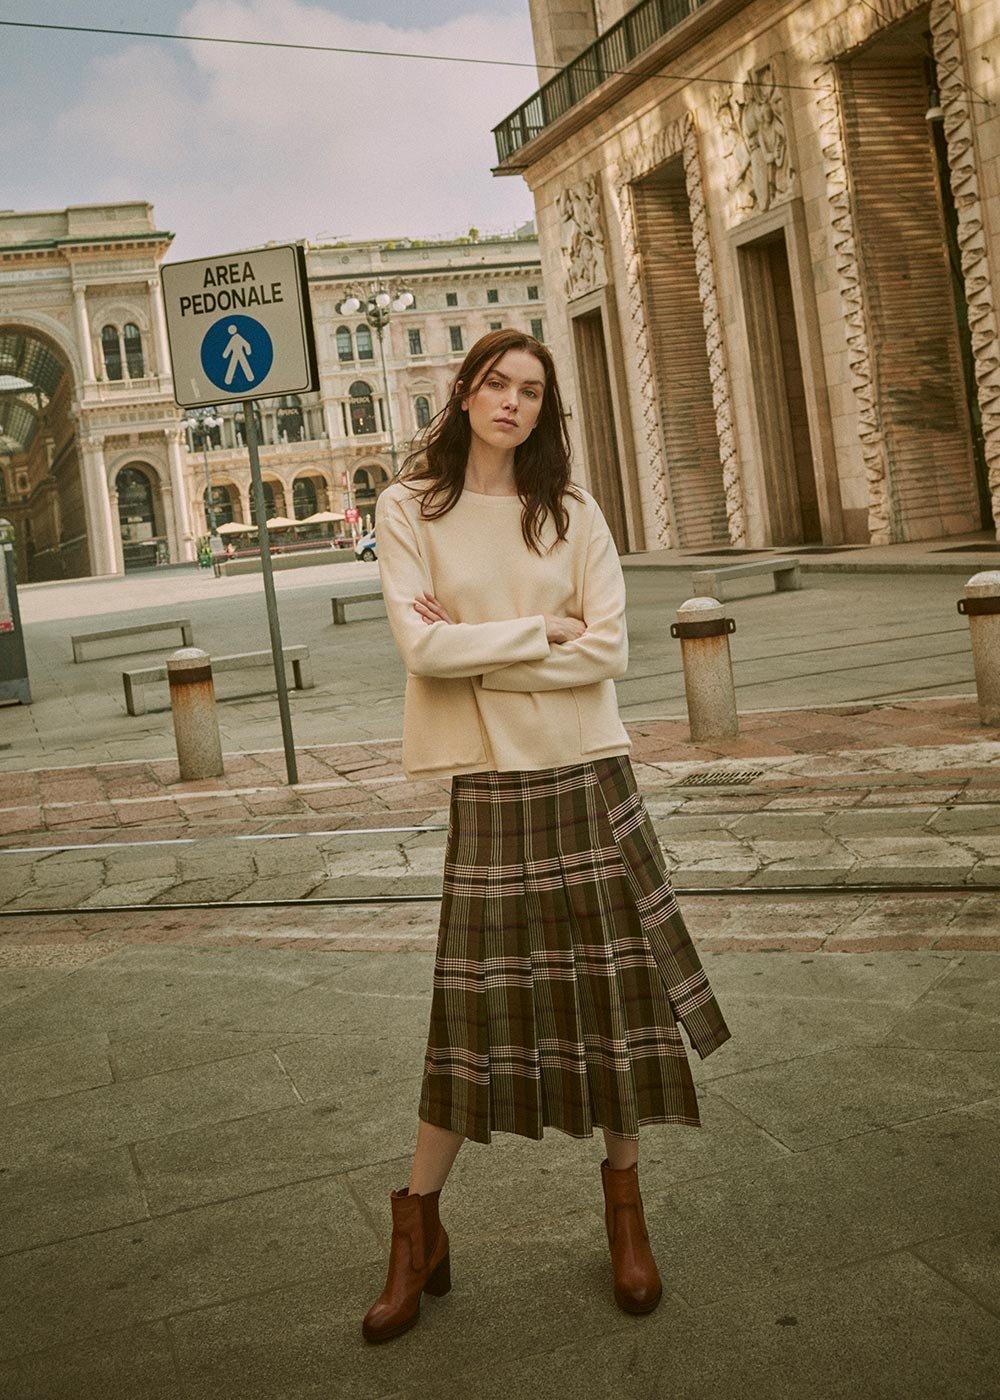 Giusy kilt model skirt - Timo / Porpora Fantasia - Woman